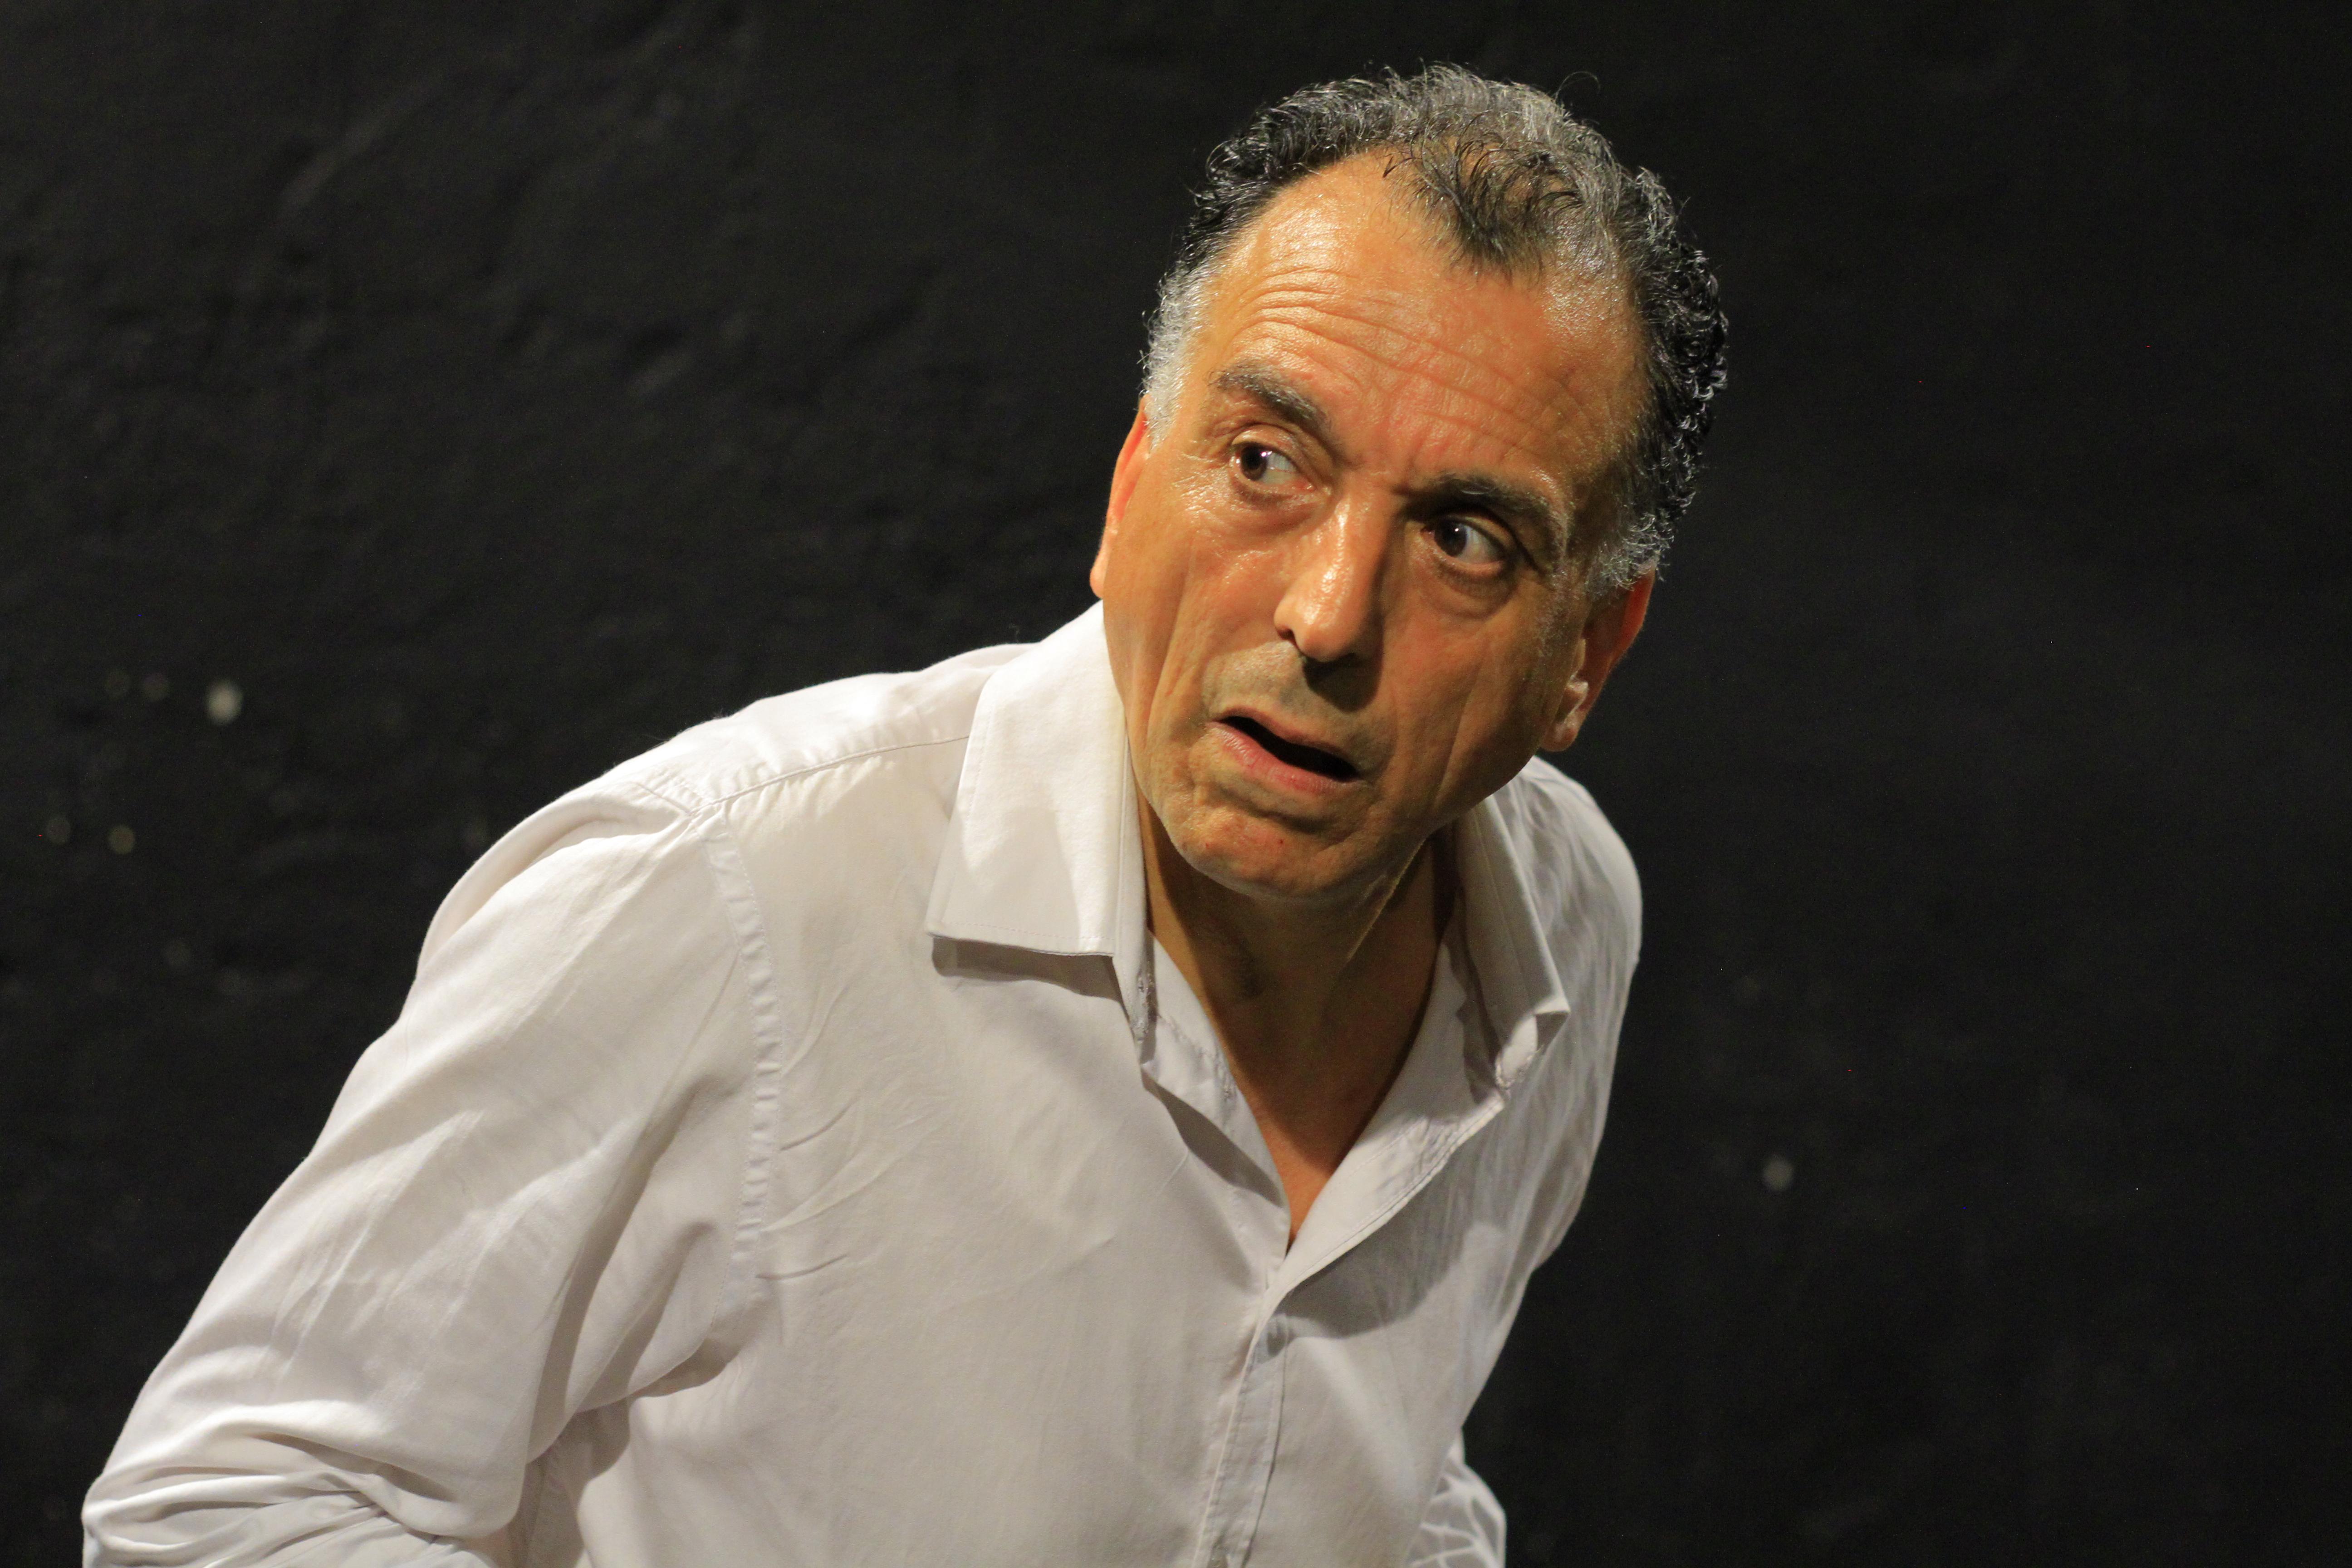 Théâtre Prémol – Ali Djilali